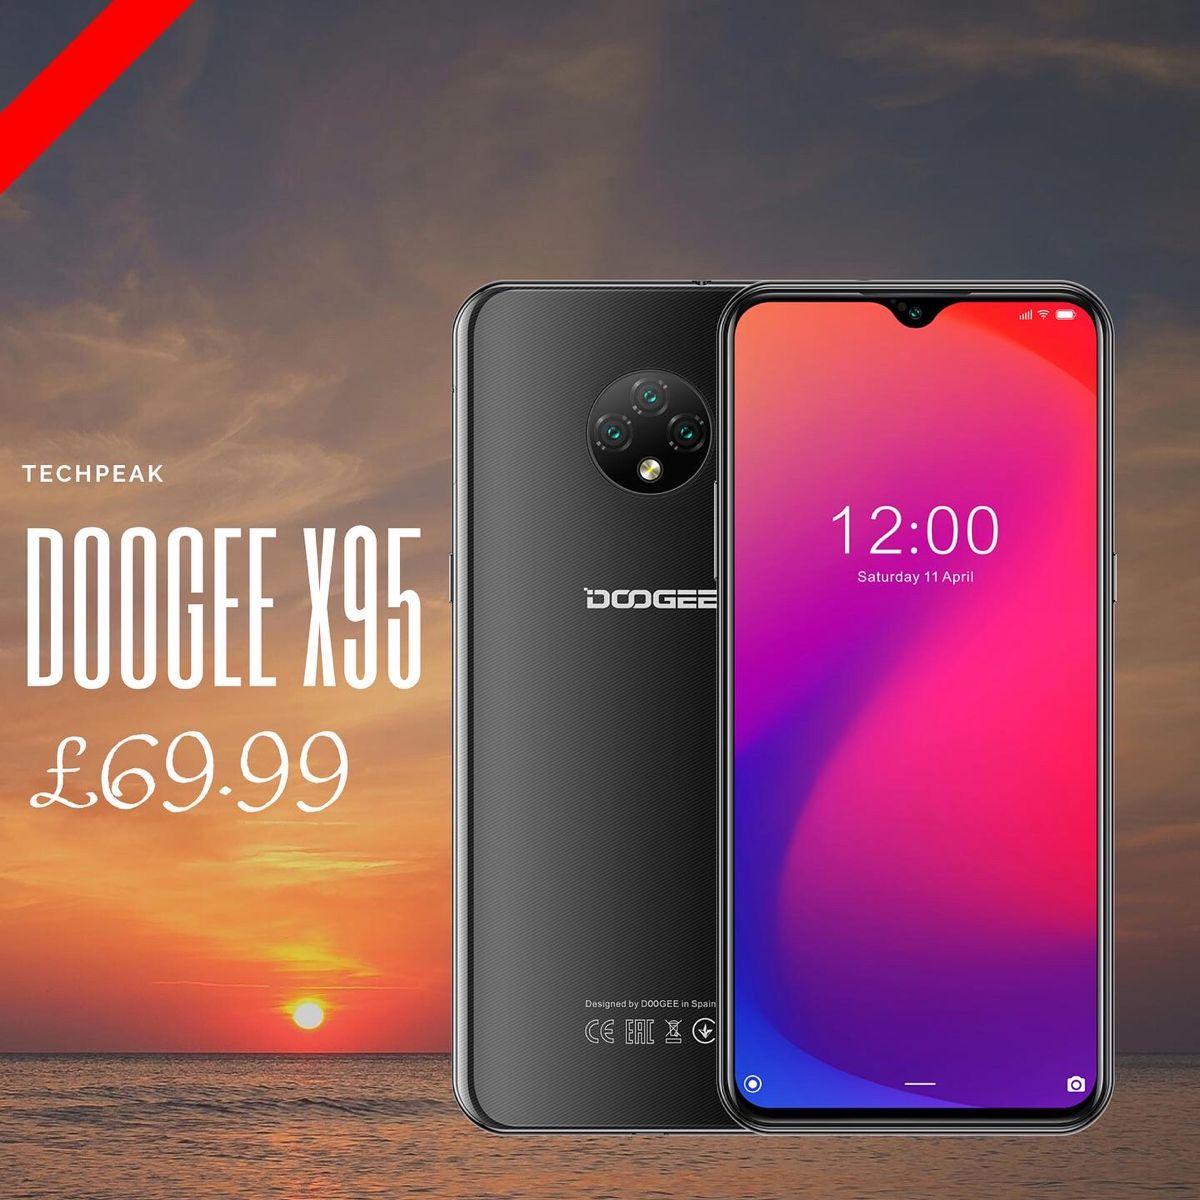 Doogee X95 In 2020 External Hard Drive Samsung Galaxy Phone Cheap Phones